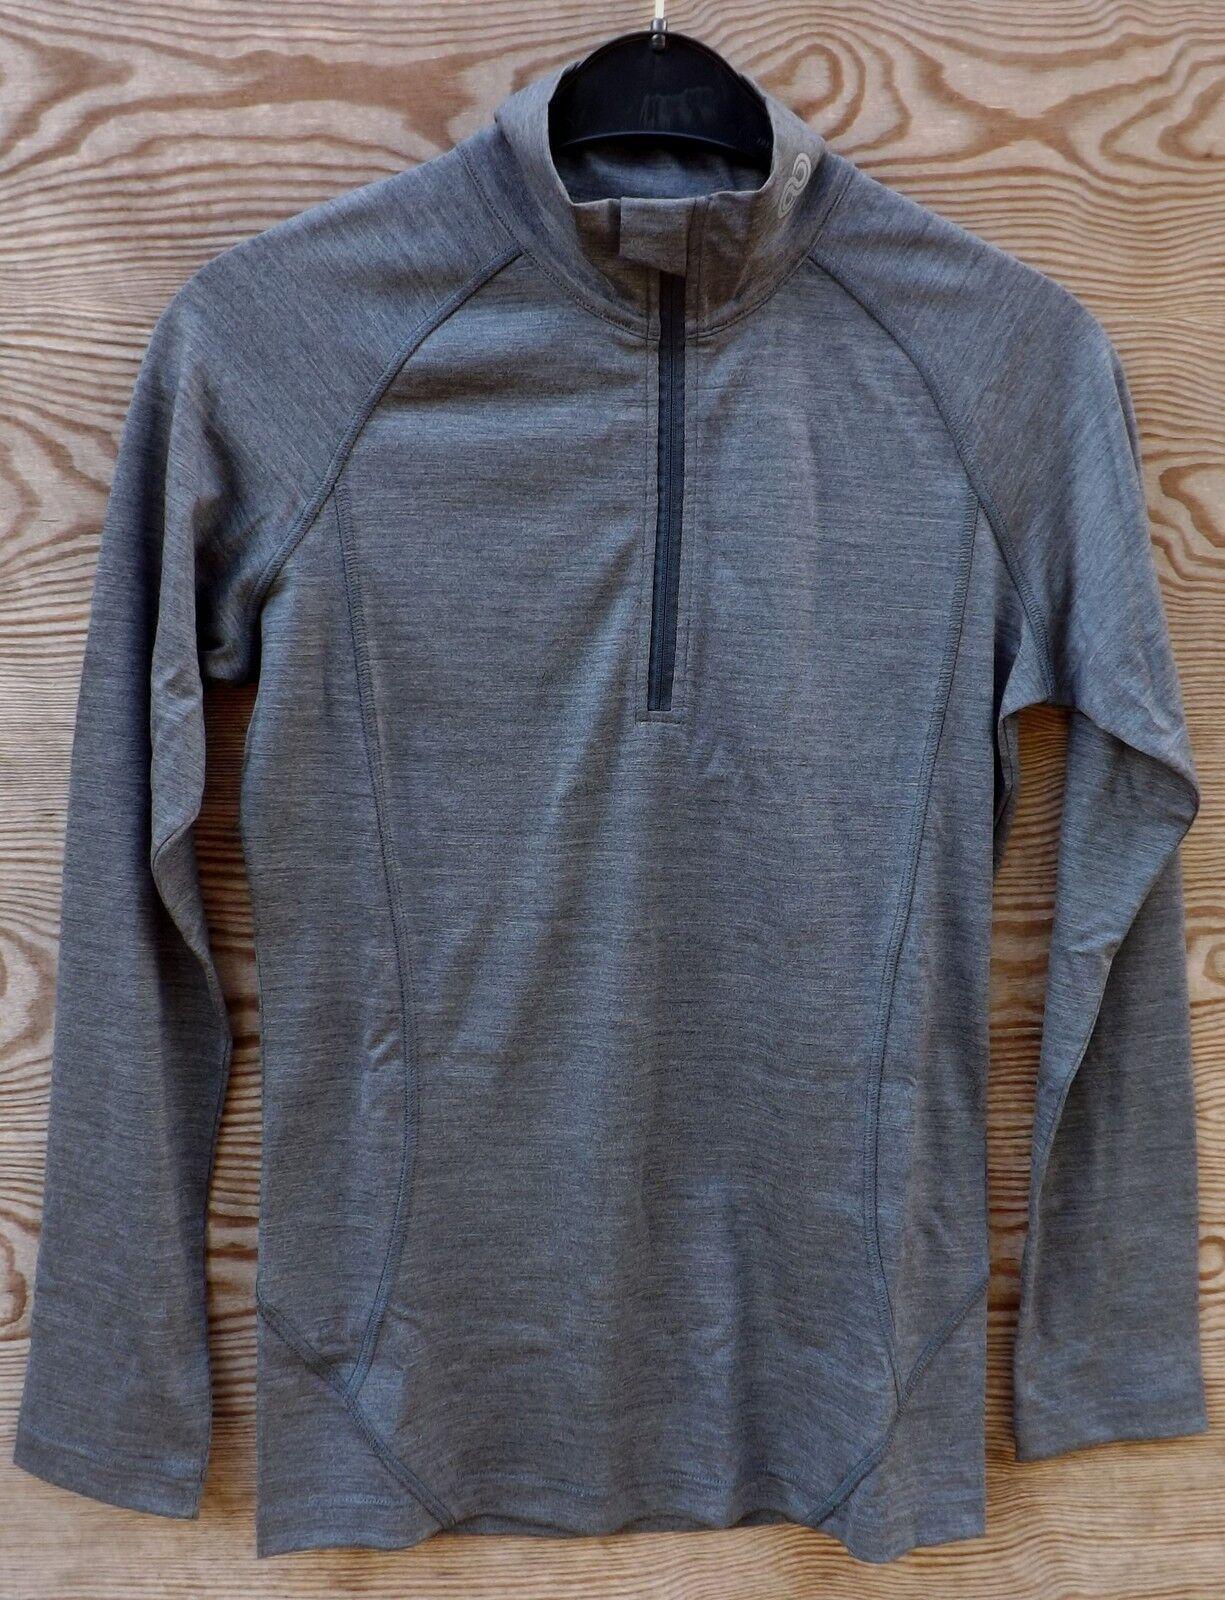 Reda rewoolution Lindsey-Women's Merino  Half Zip Longsleeve 190, Charcoal  online shopping